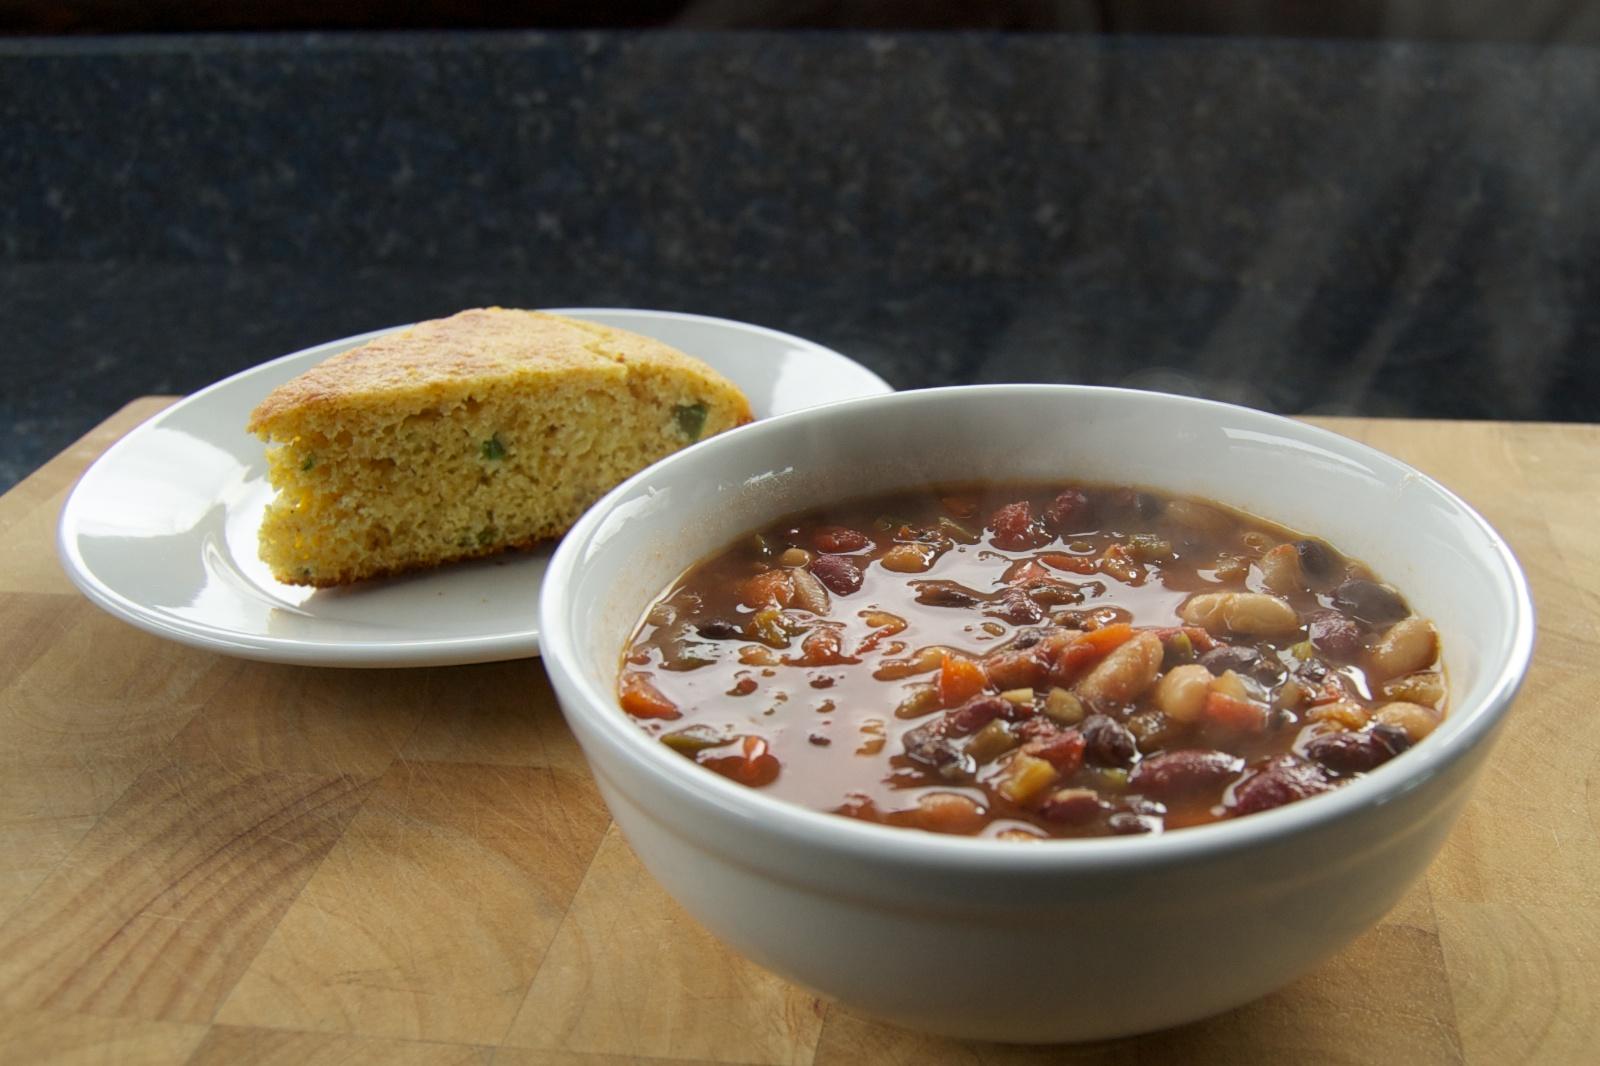 http://blog.rickk.com/food/2012/03/24/ate.2012.03.24.l.jpg